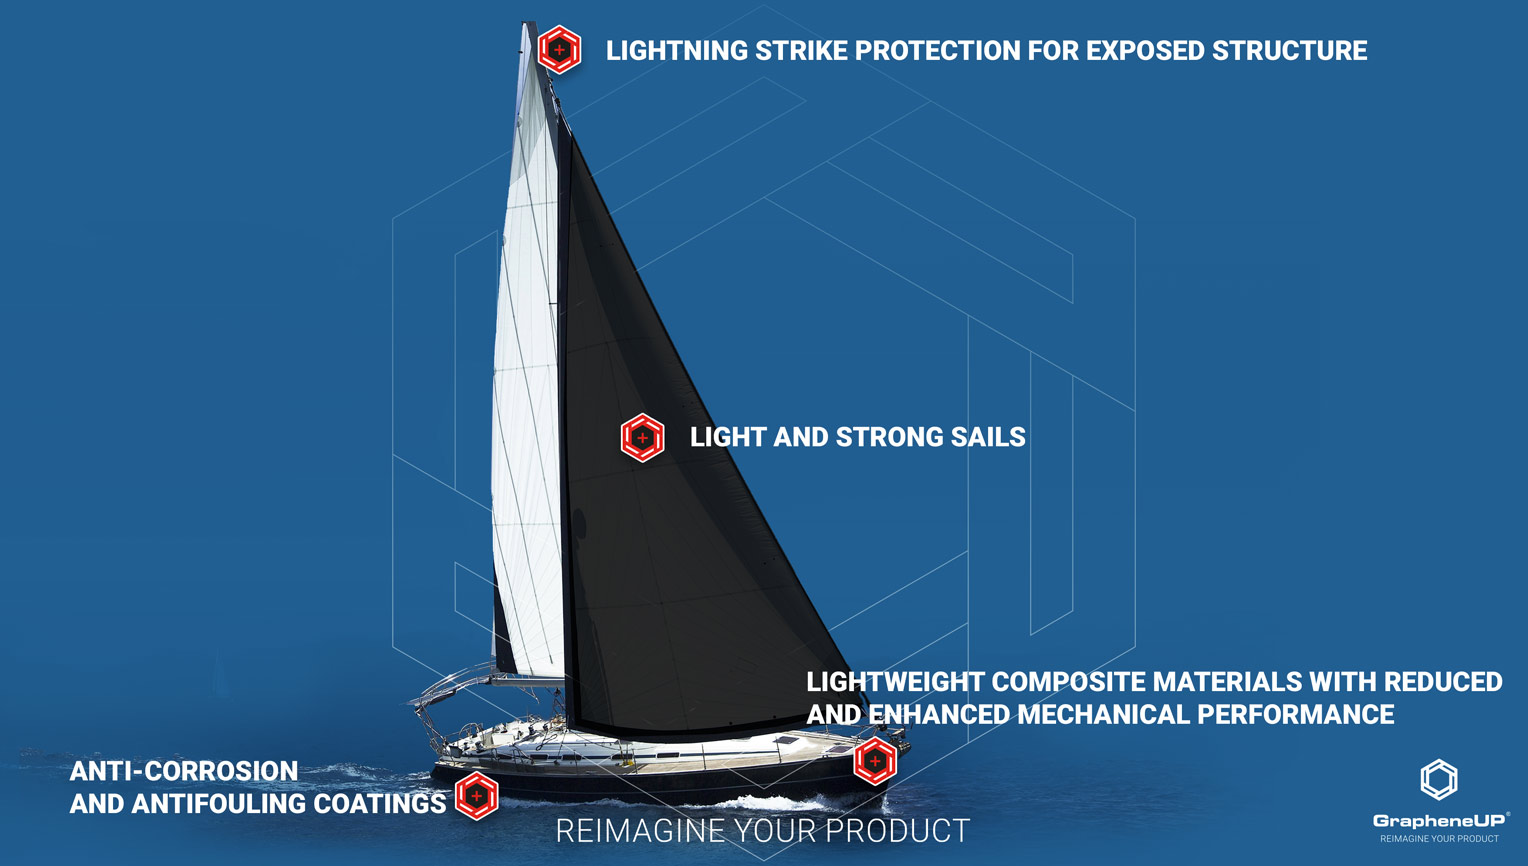 graphene enhanced product sailing boats